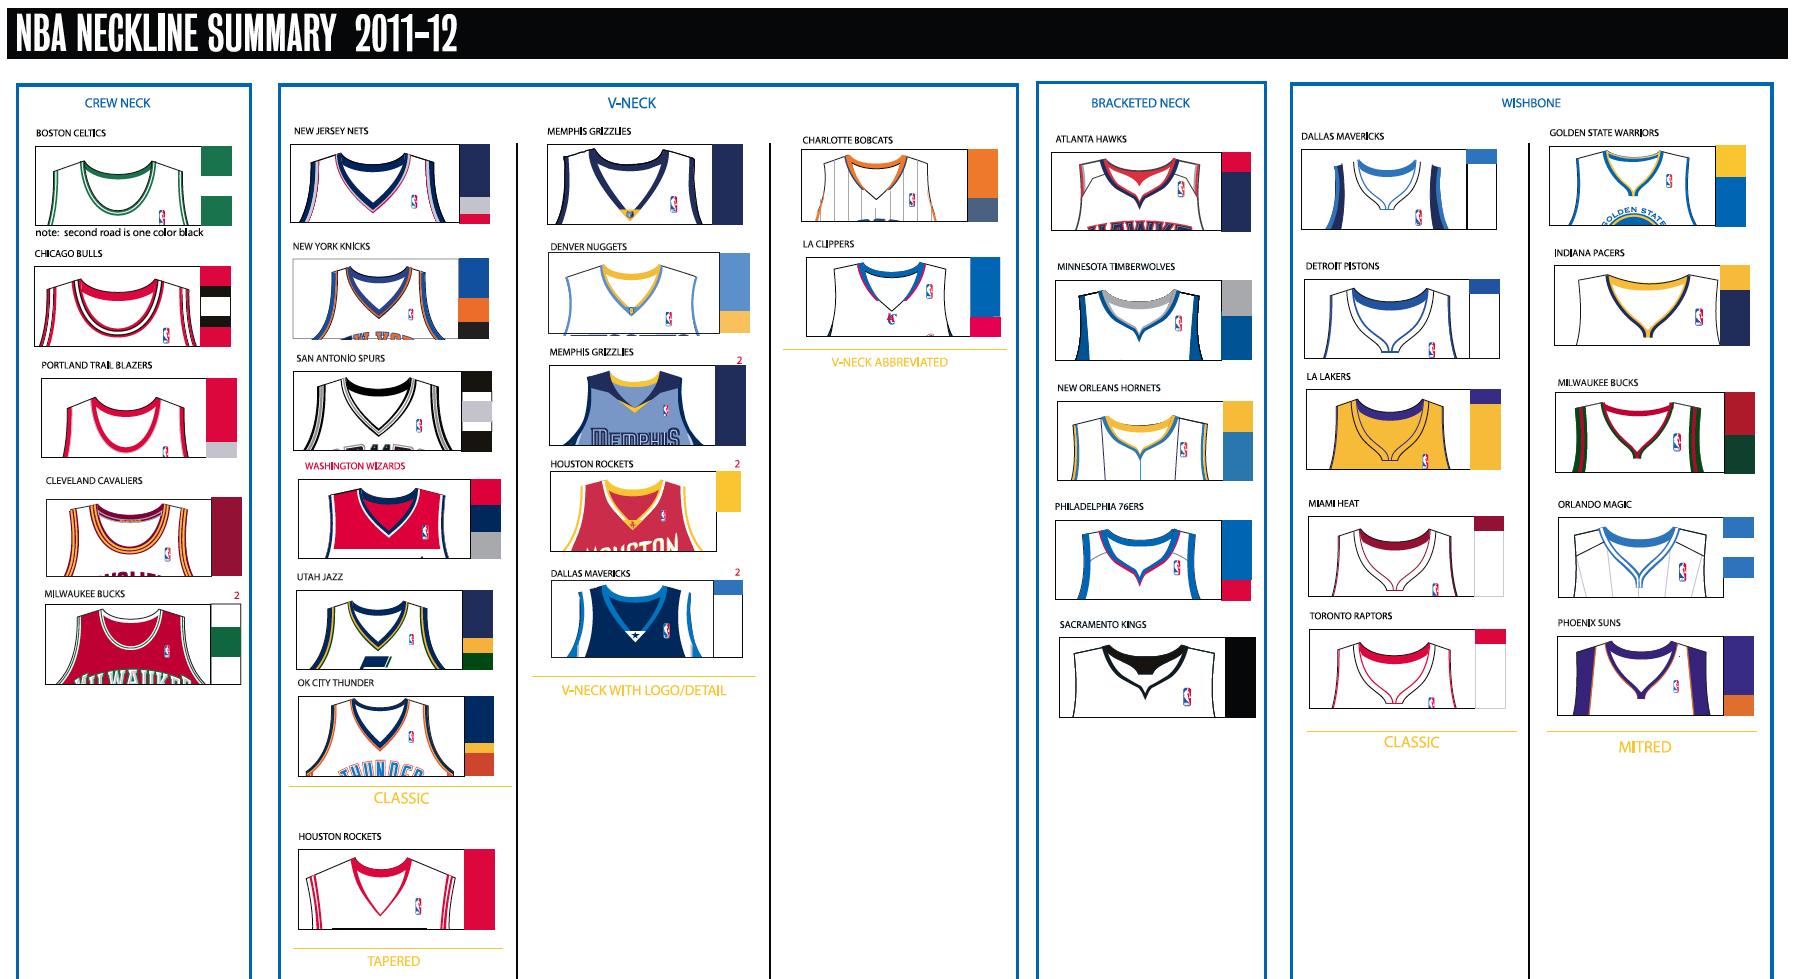 sneakers for cheap 75668 8871a 12 dallas mavericks jersey font